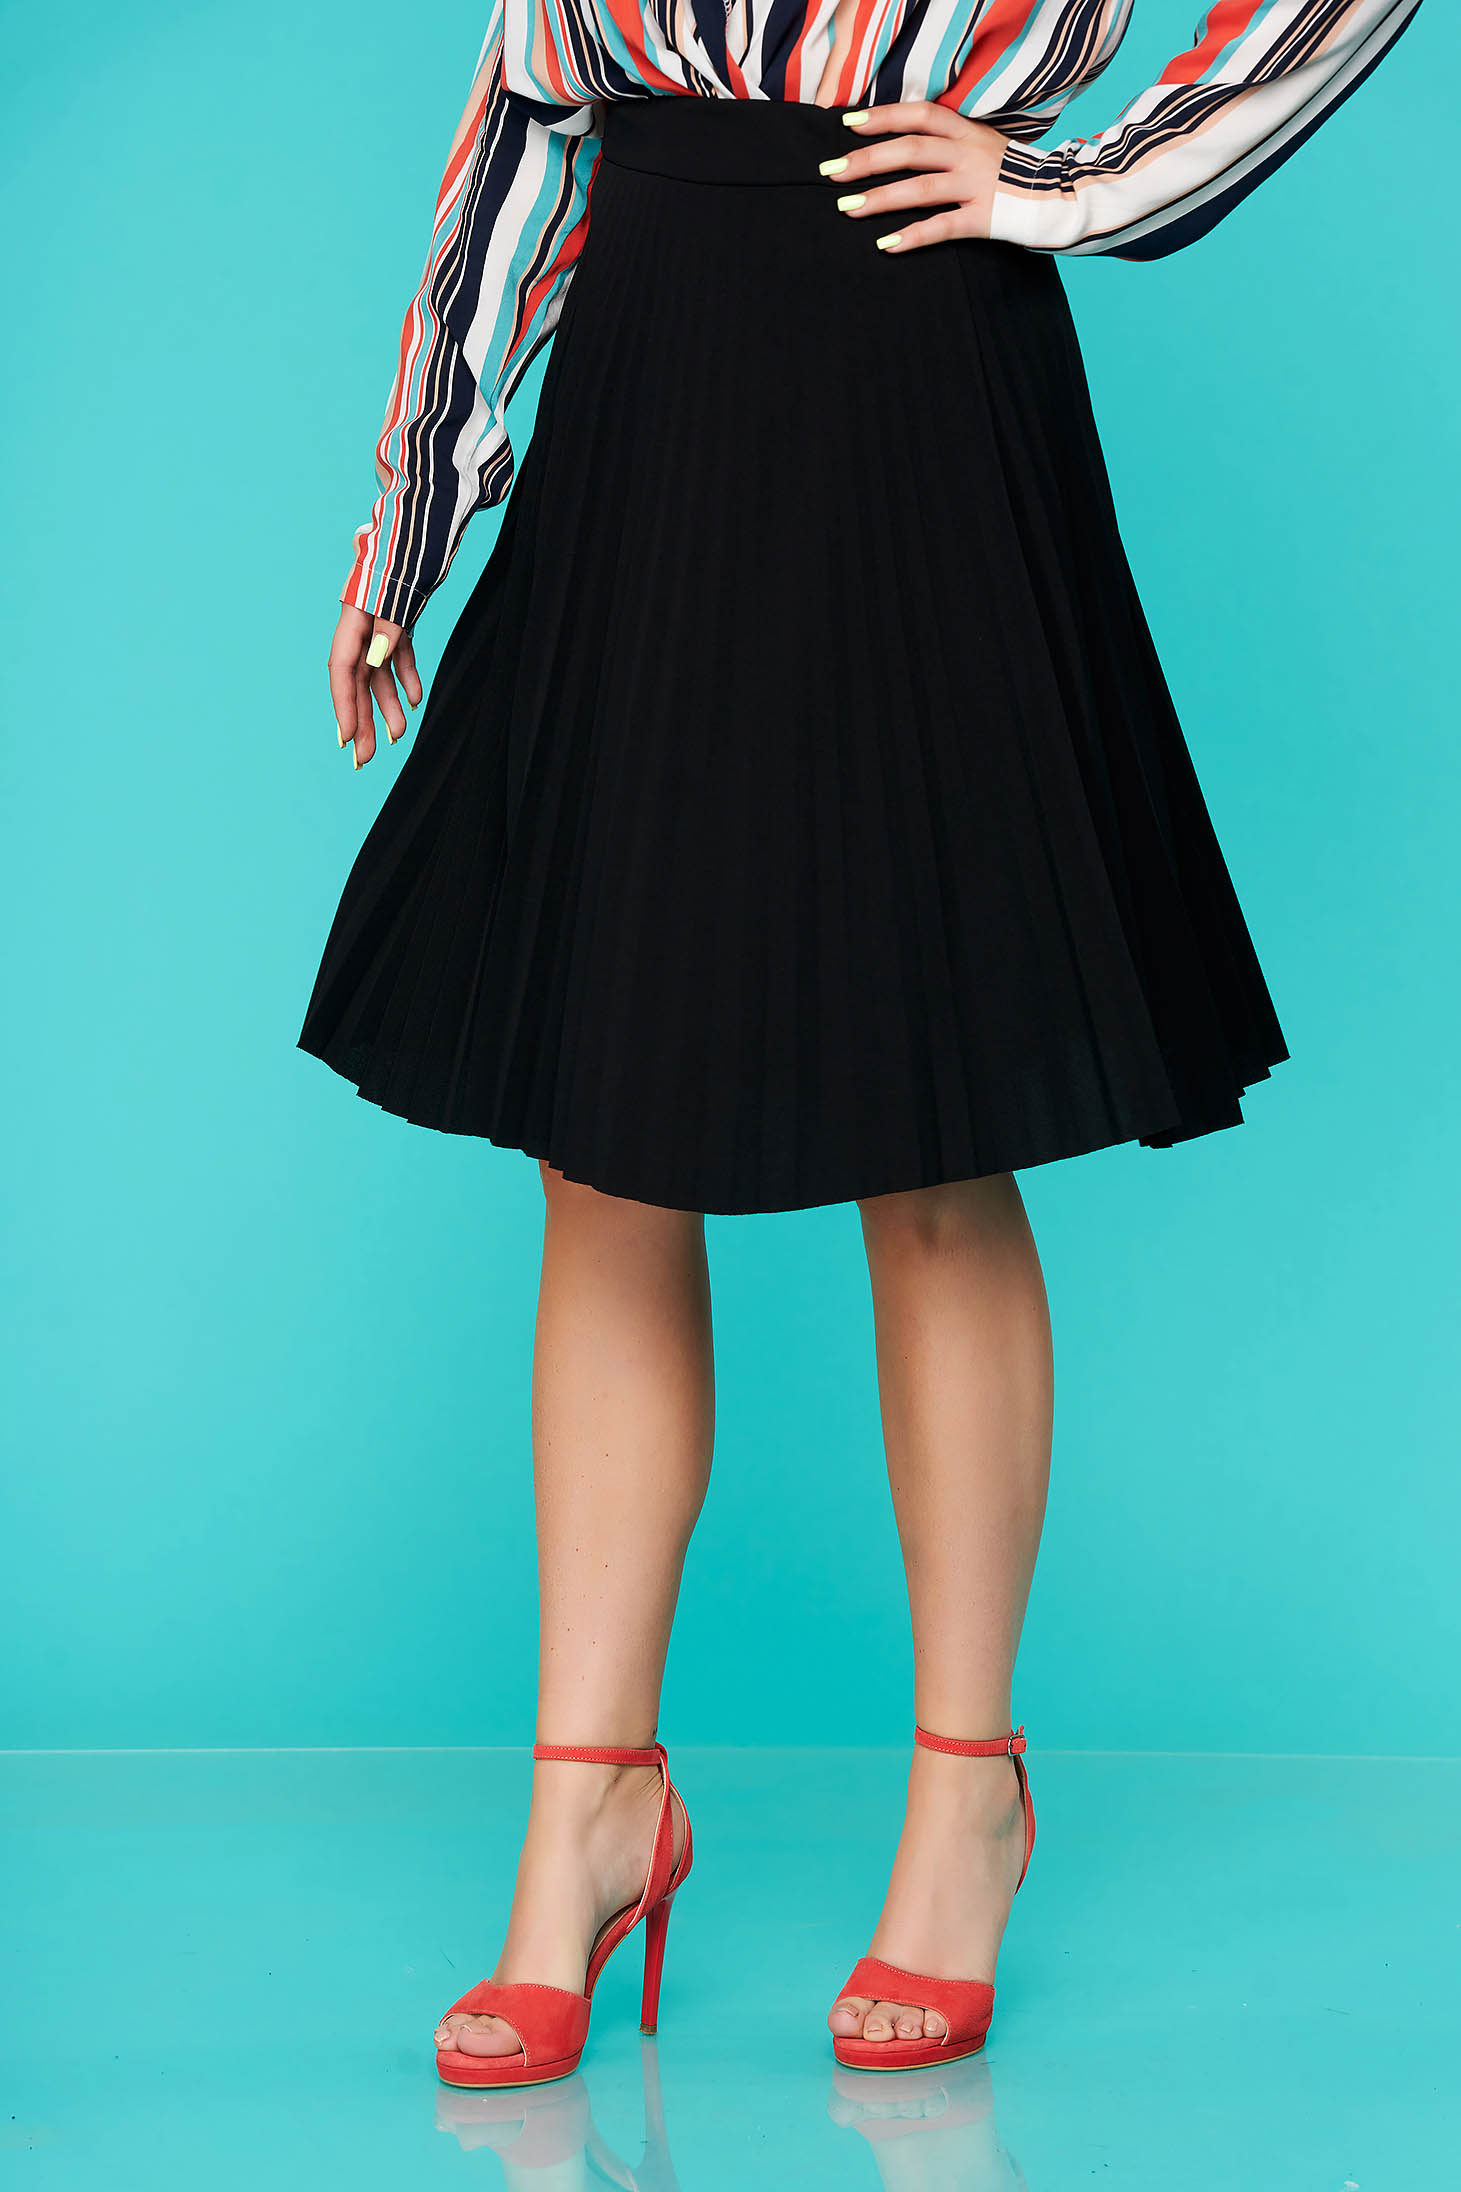 Black skirt midi cloche from elastic fabric folded up